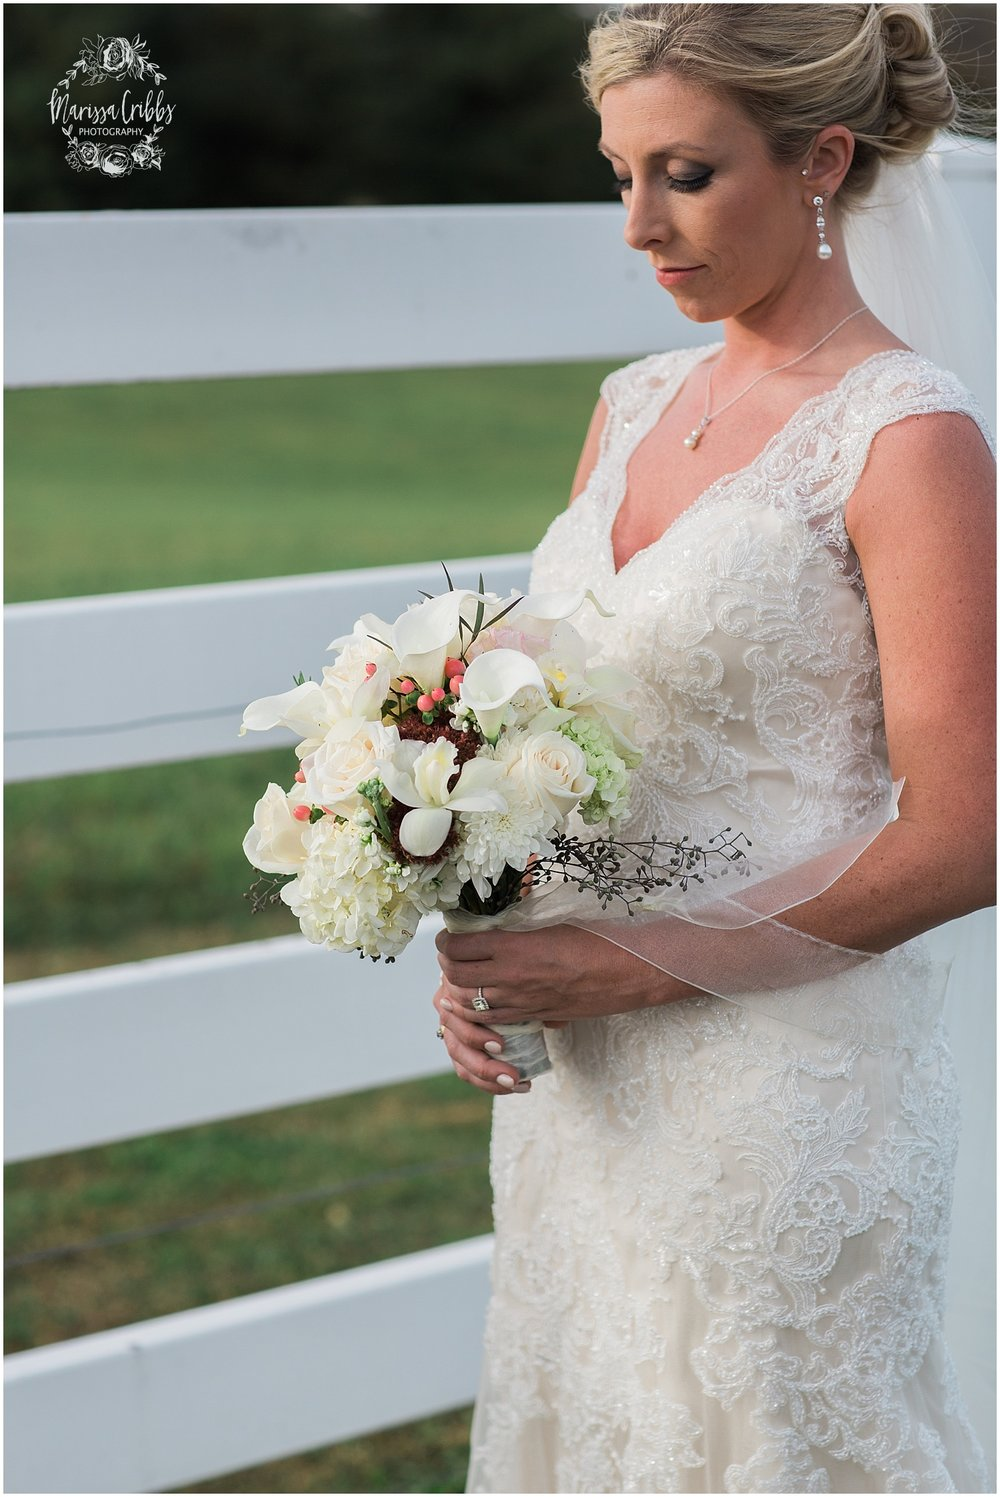 Alex & Amie | Eighteen Ninety Event Space | Marissa Cribbs Photography | Kansas City Perfect Wedding Guide_1306.jpg